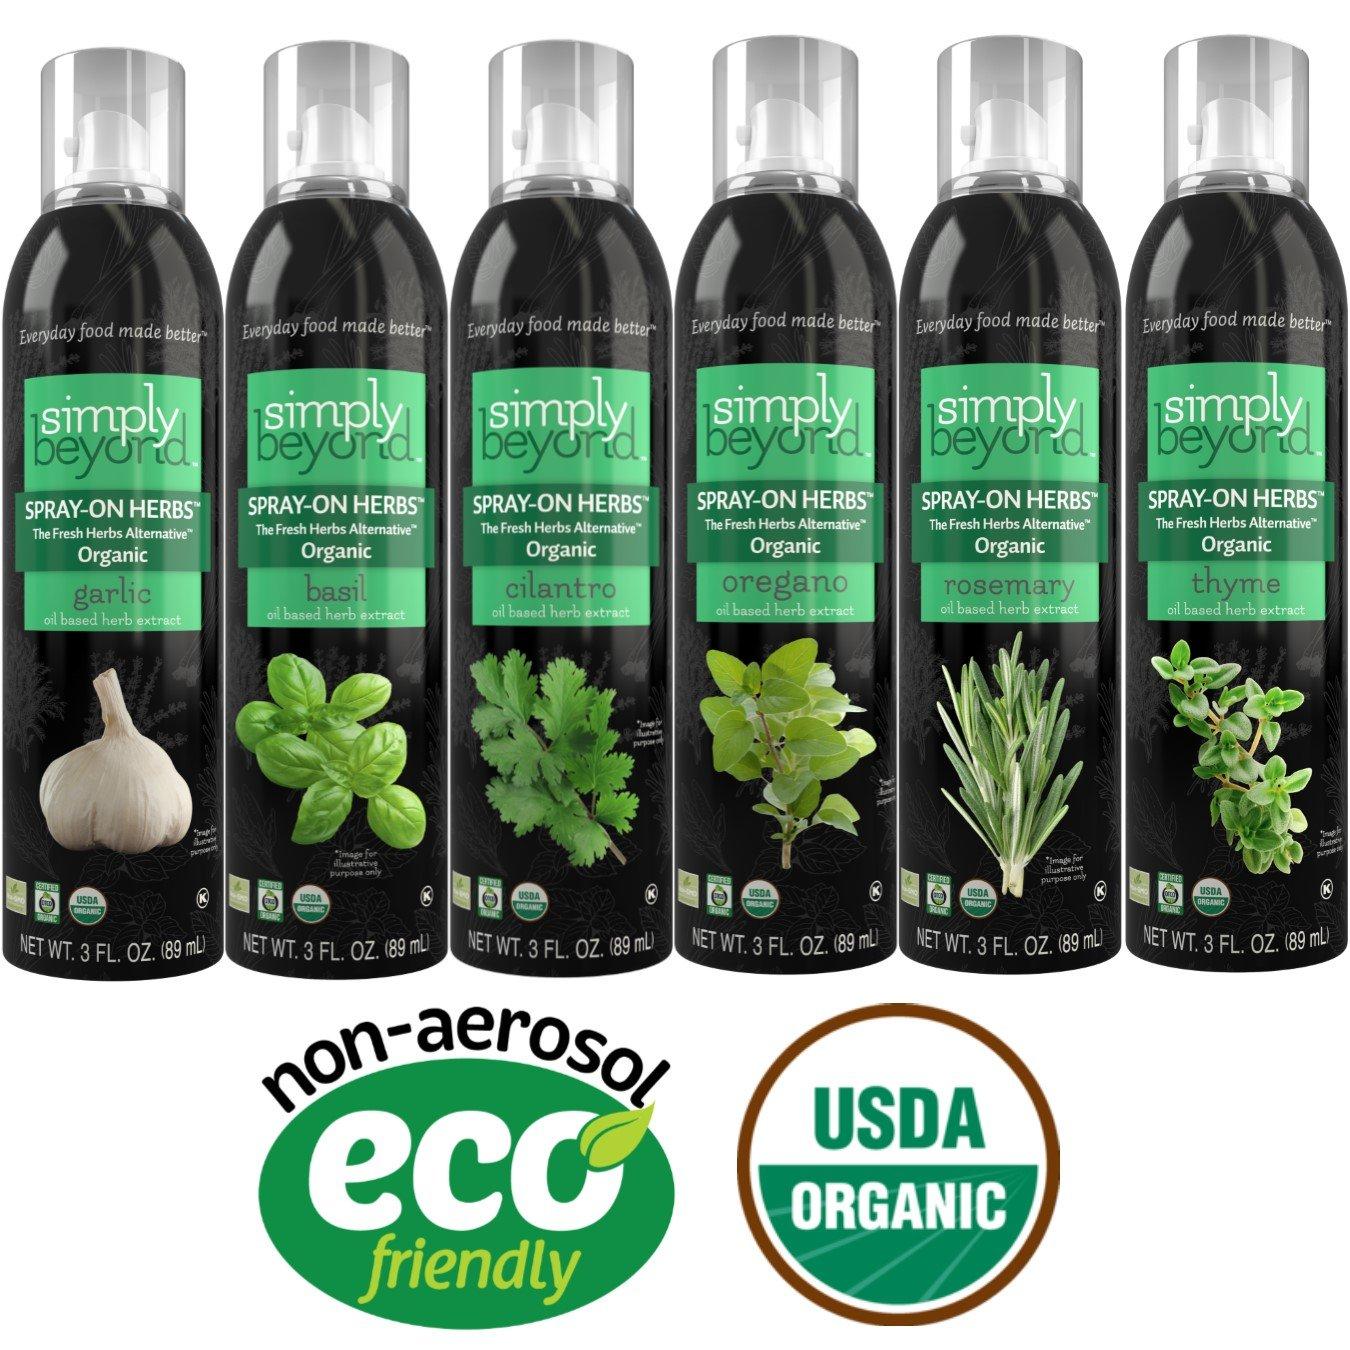 Simply Beyond Organic Spray-On Herbs Starter Kit (Starter Kit, 6 Pack)